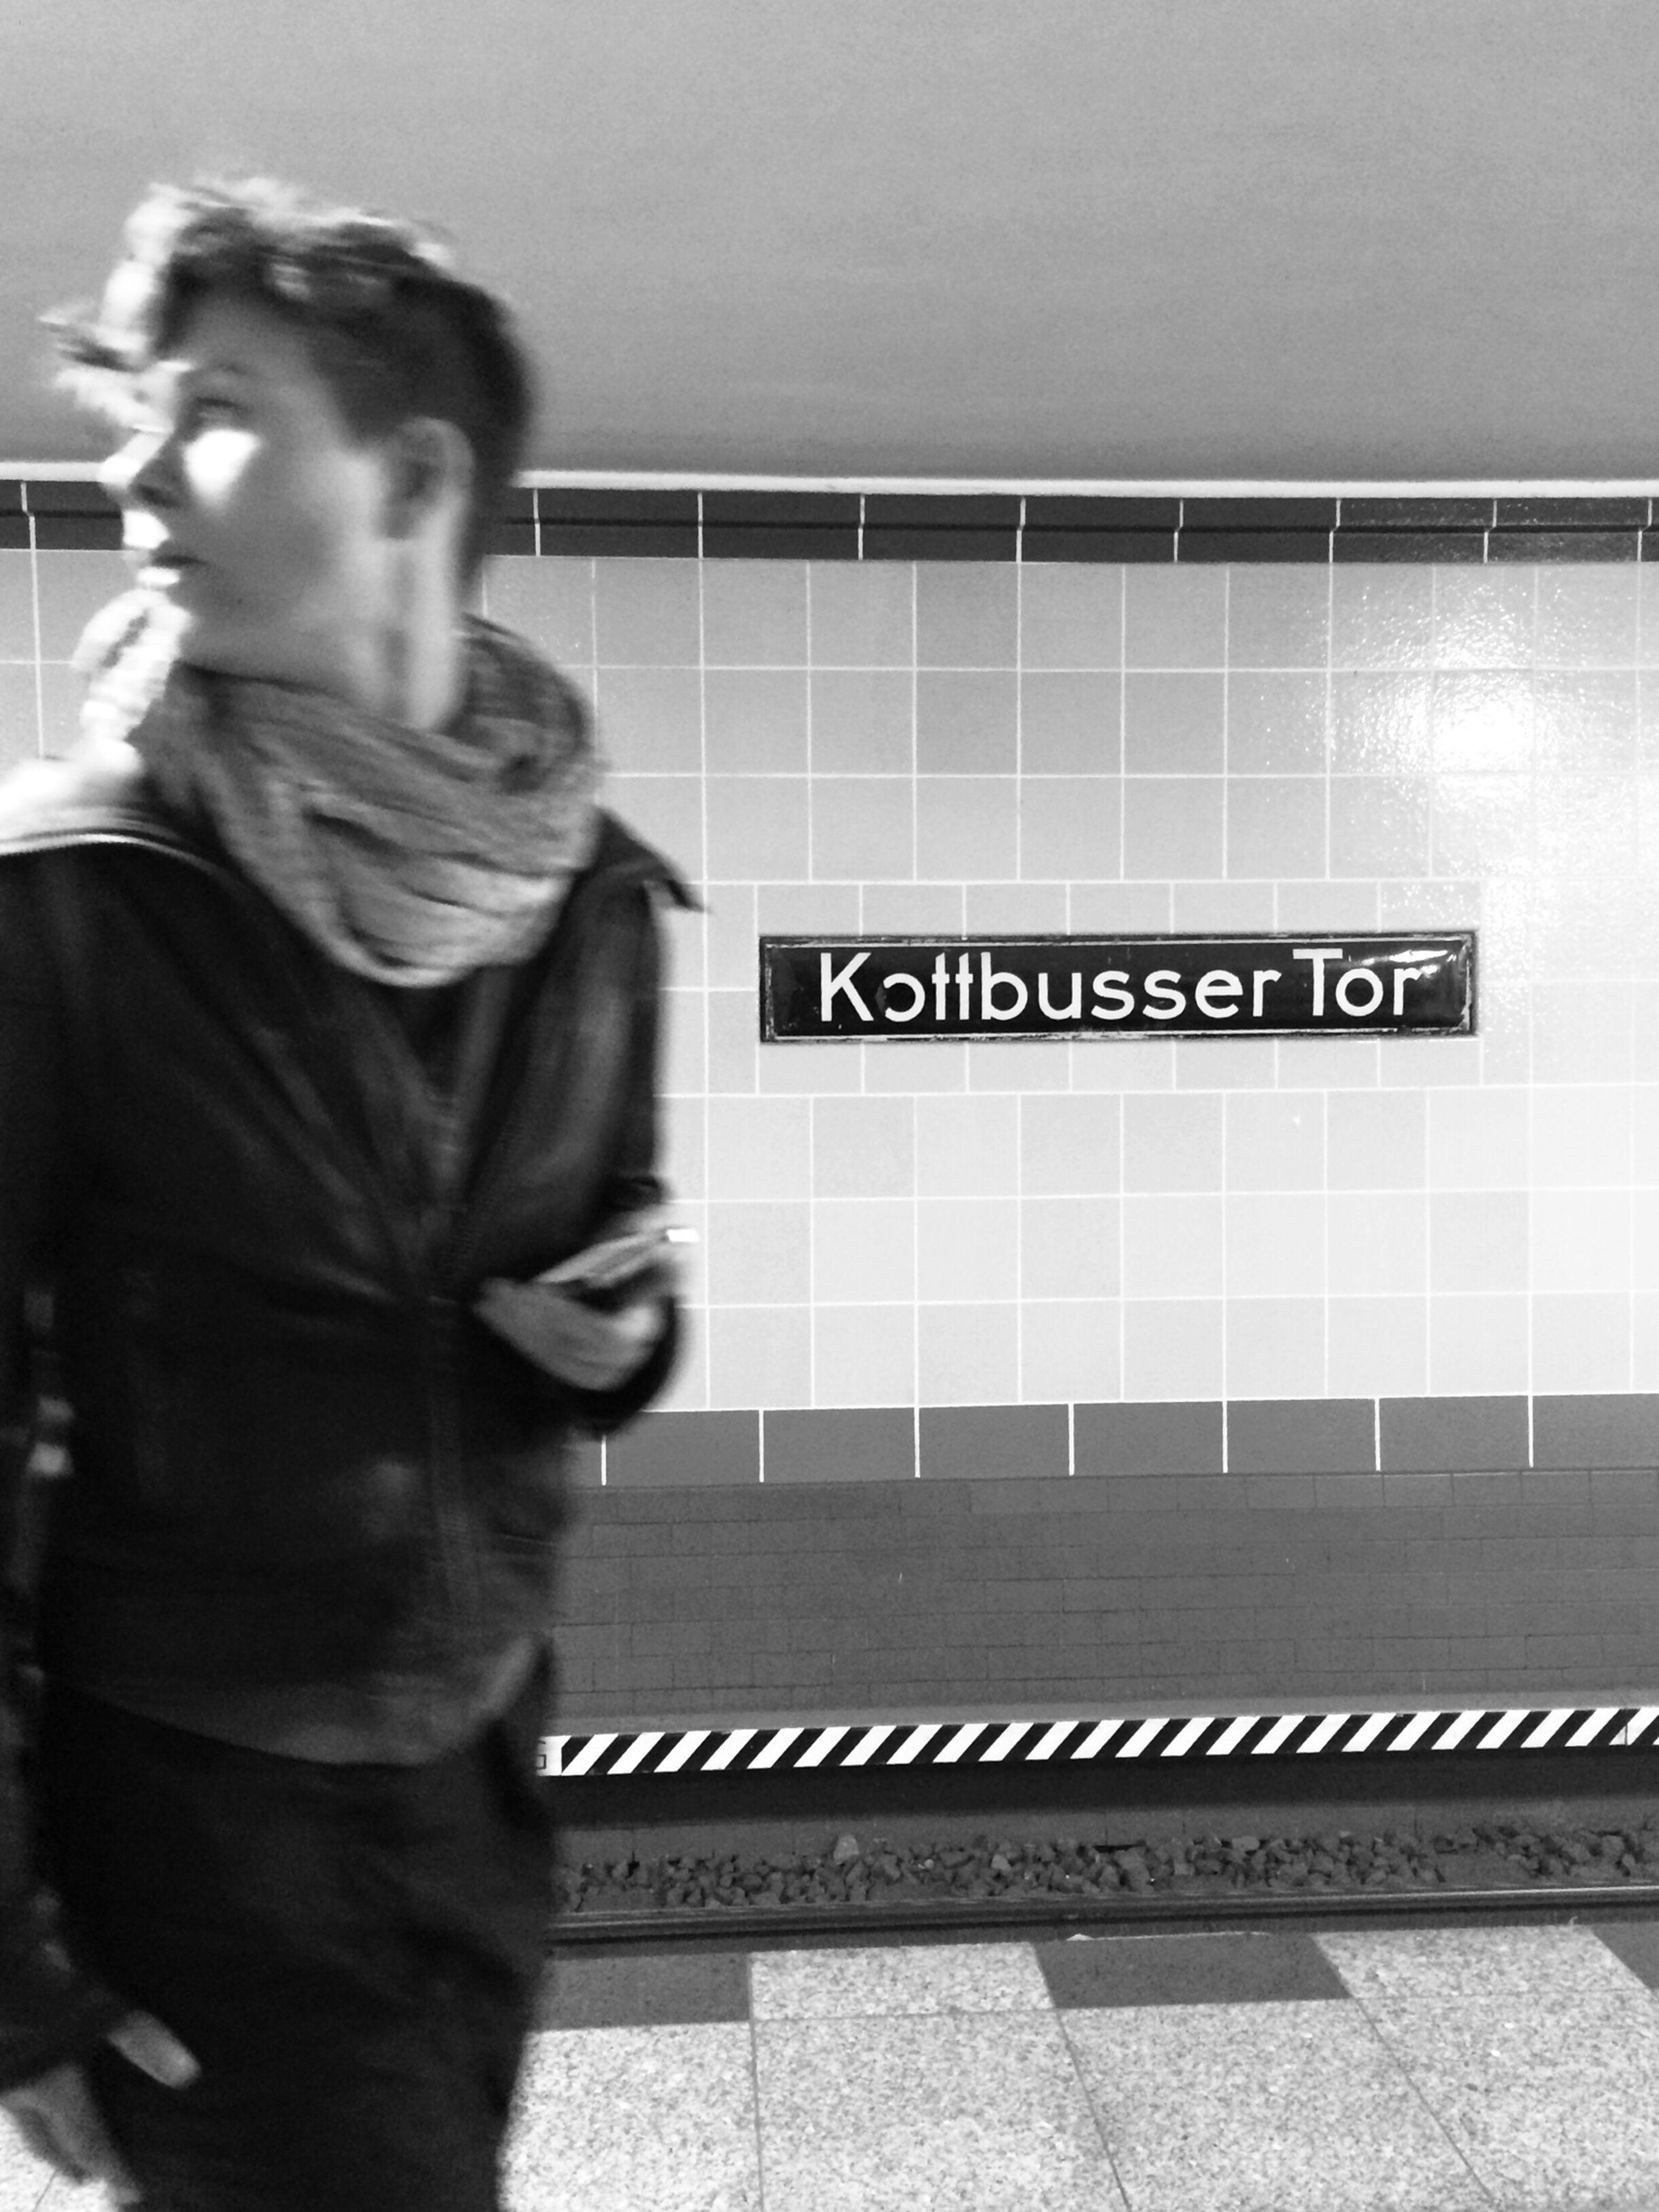 communication, text, indoors, lifestyles, western script, railroad station, public transportation, railroad station platform, standing, rail transportation, casual clothing, leisure activity, men, train - vehicle, transportation, technology, three quarter length, subway